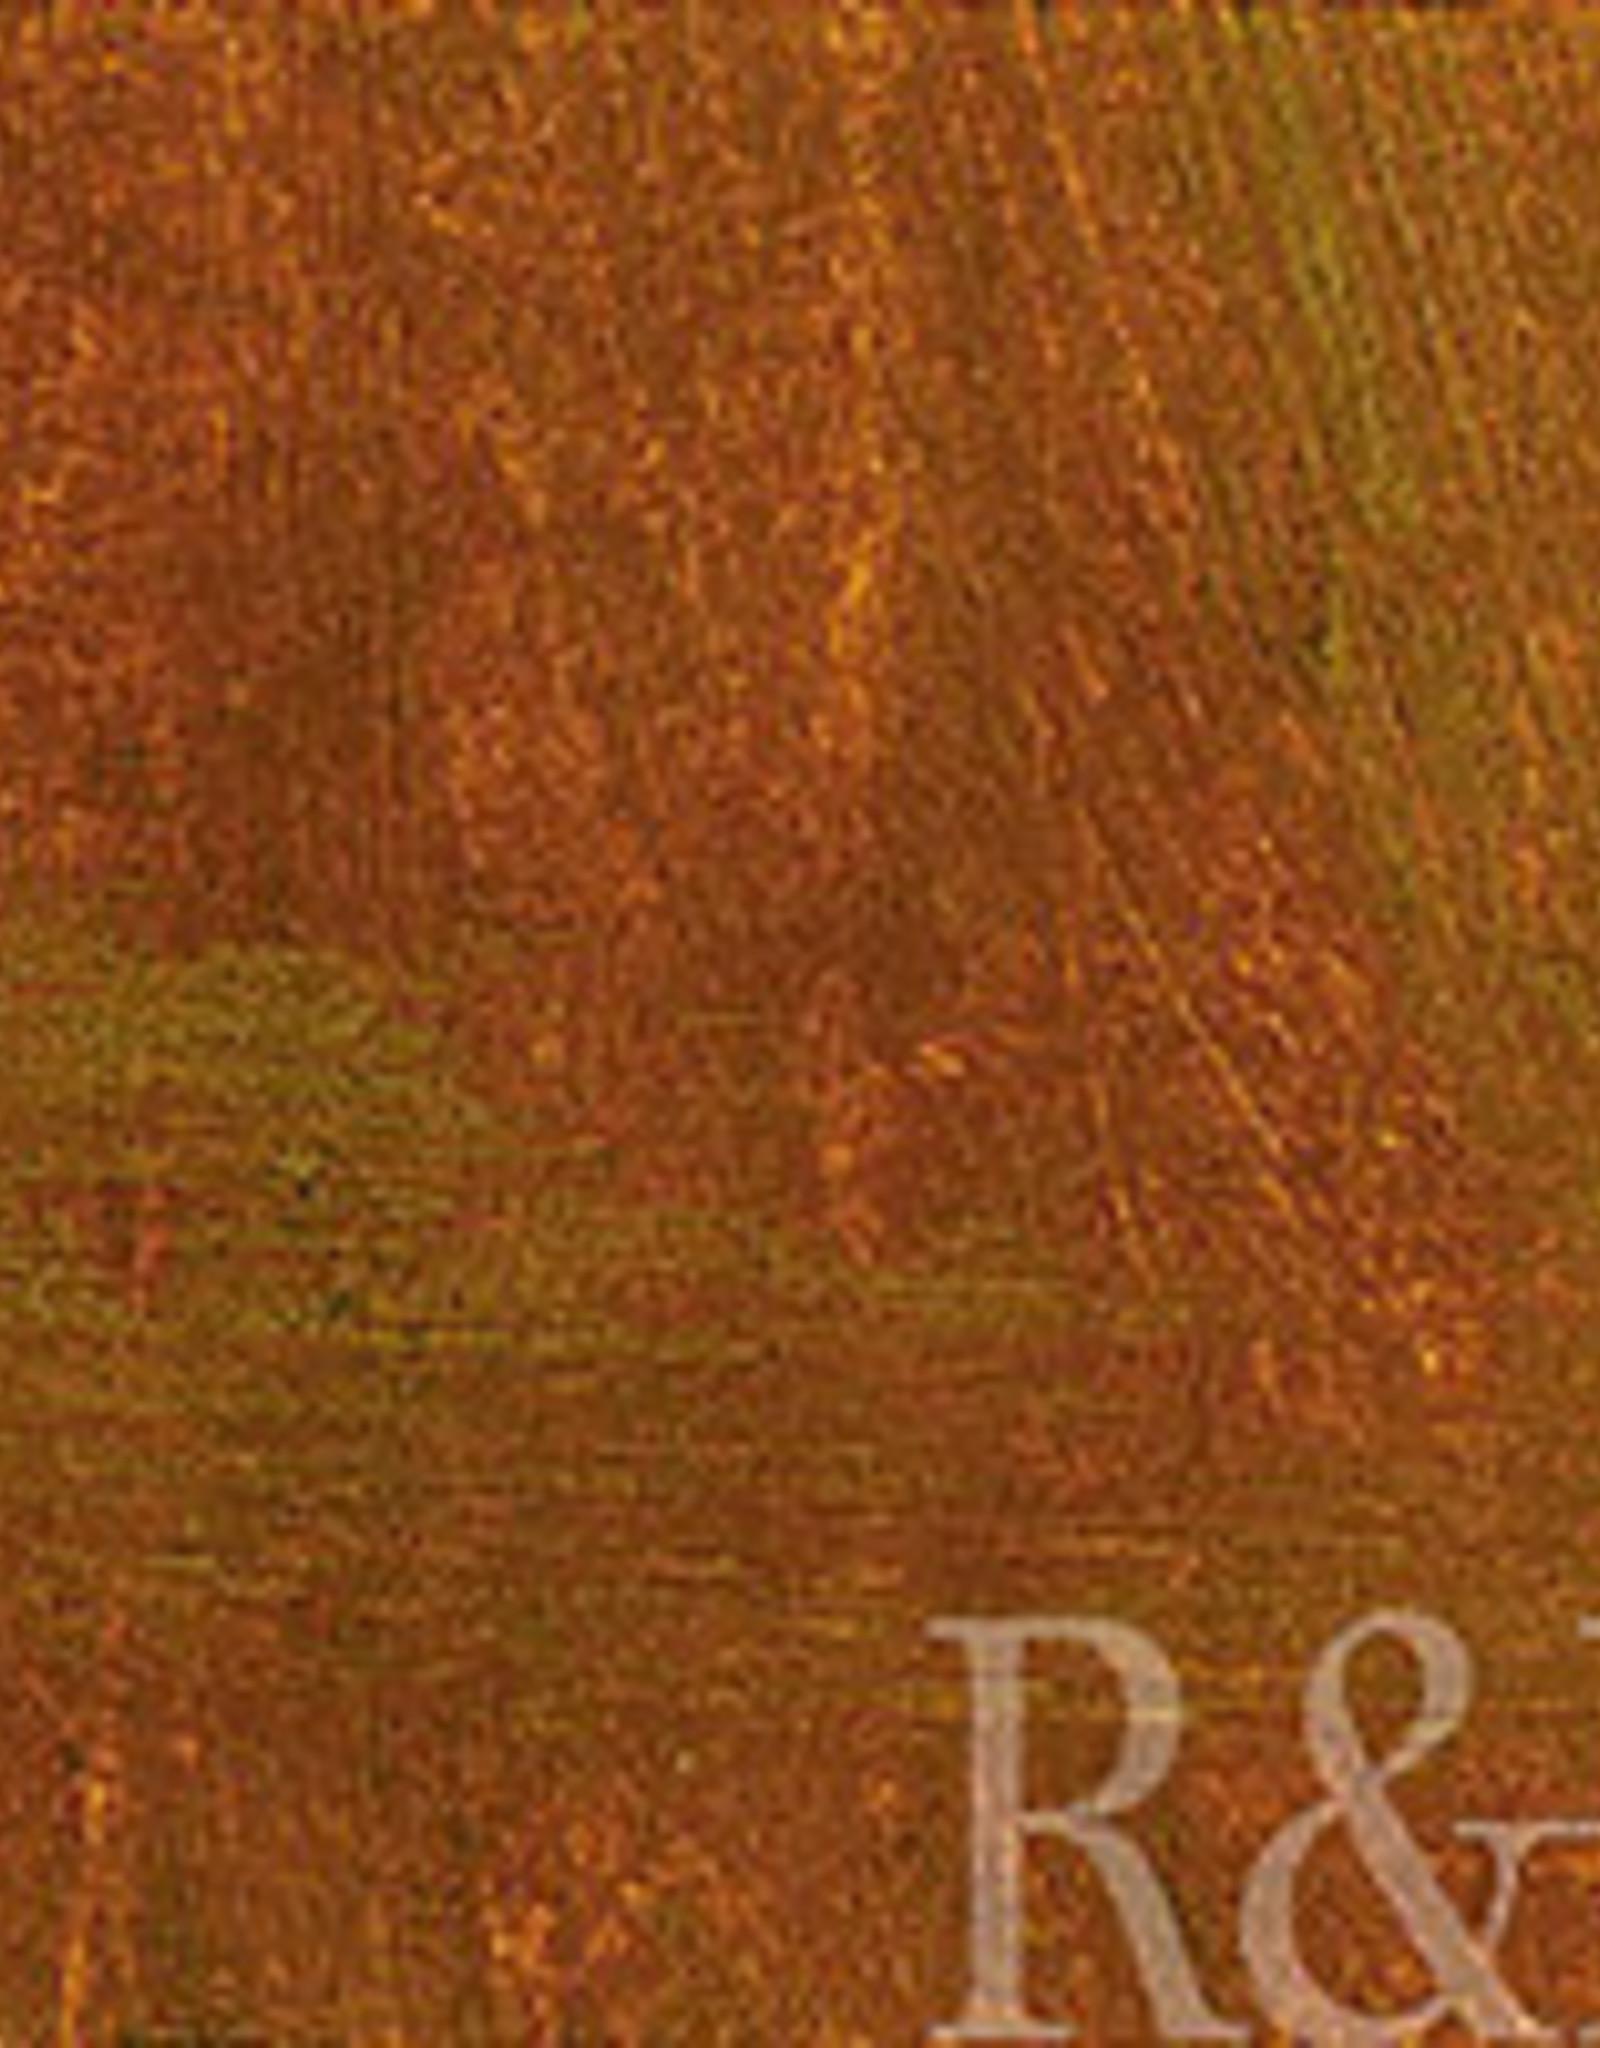 R&F Handmade Paints Encaustic Pigment Stick Sanguine Earth Medium